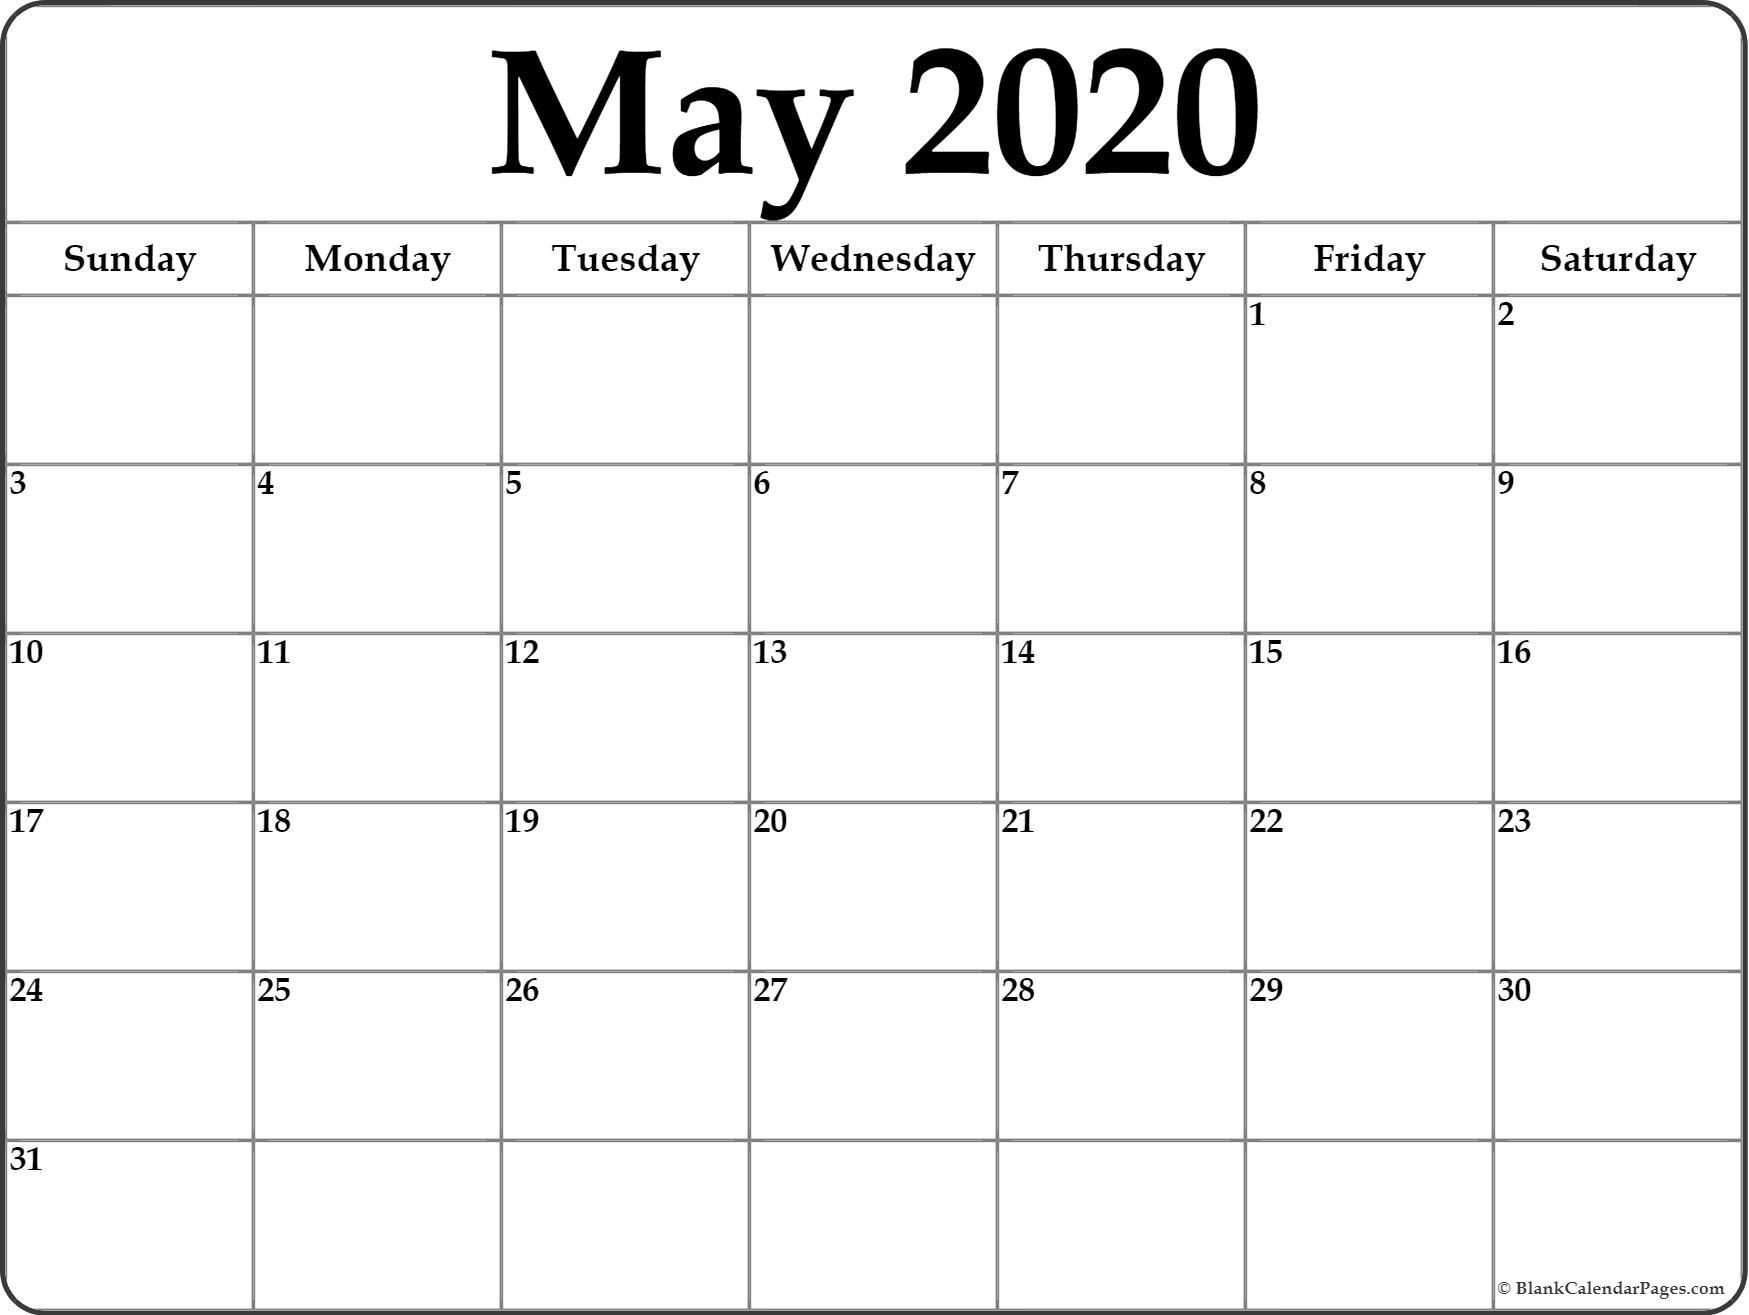 May 2020 Calendar | Free Printable Monthly Calendars intended for 2020 Free Monthly Printable Calendars